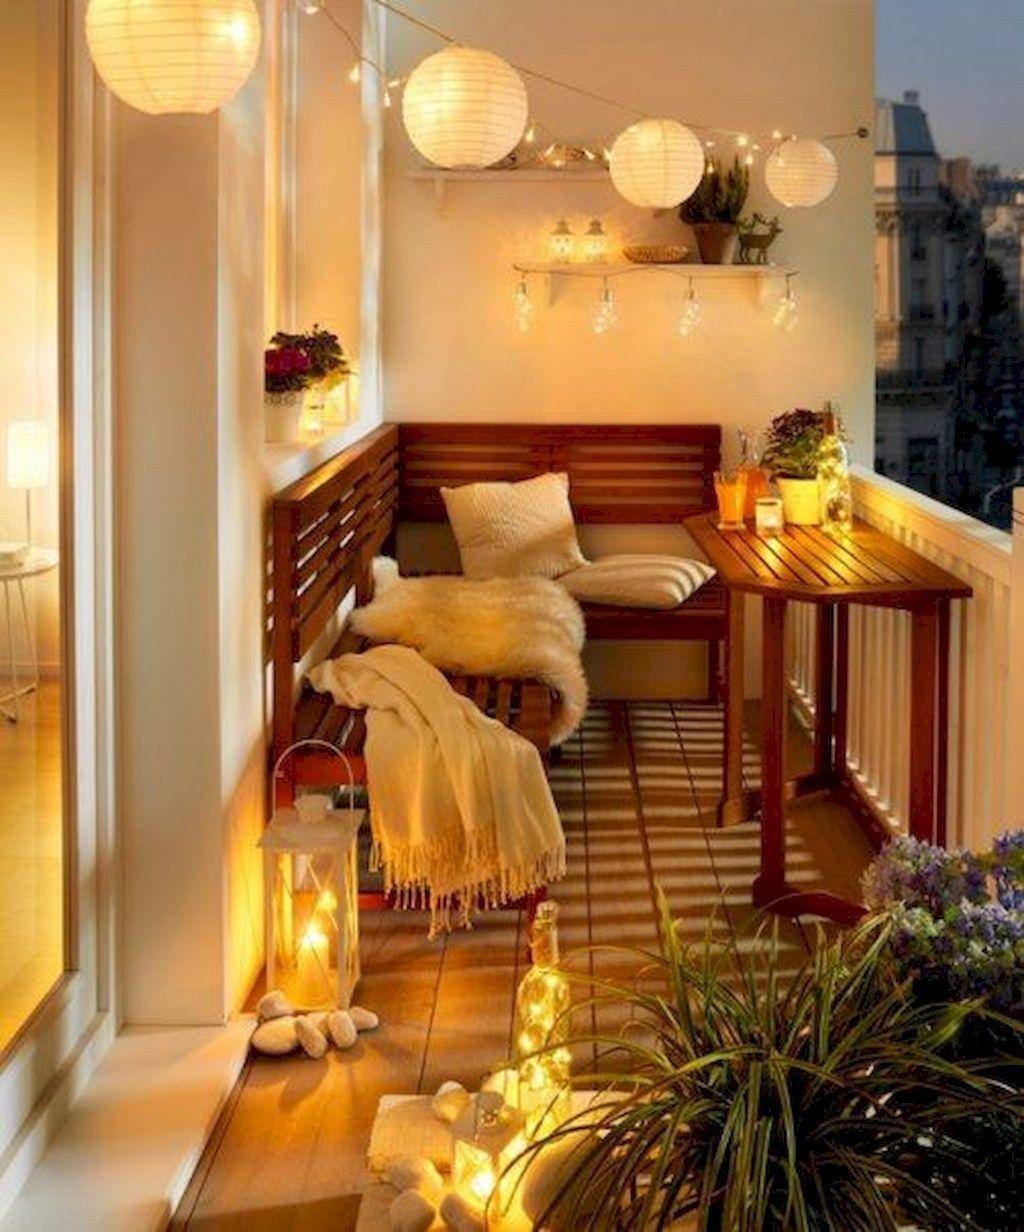 63 Cozy Apartment Balcony Decorating Ideas: Cozy Small Apartment Balcony Decorating Ideas 02